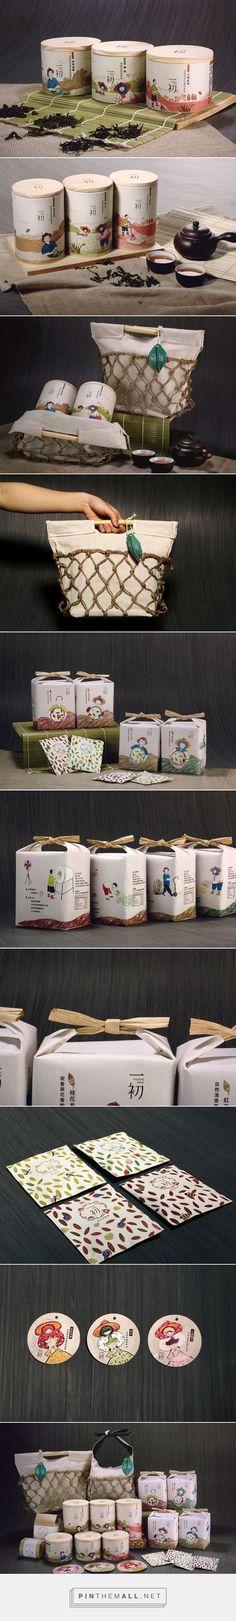 chinese tea packaging